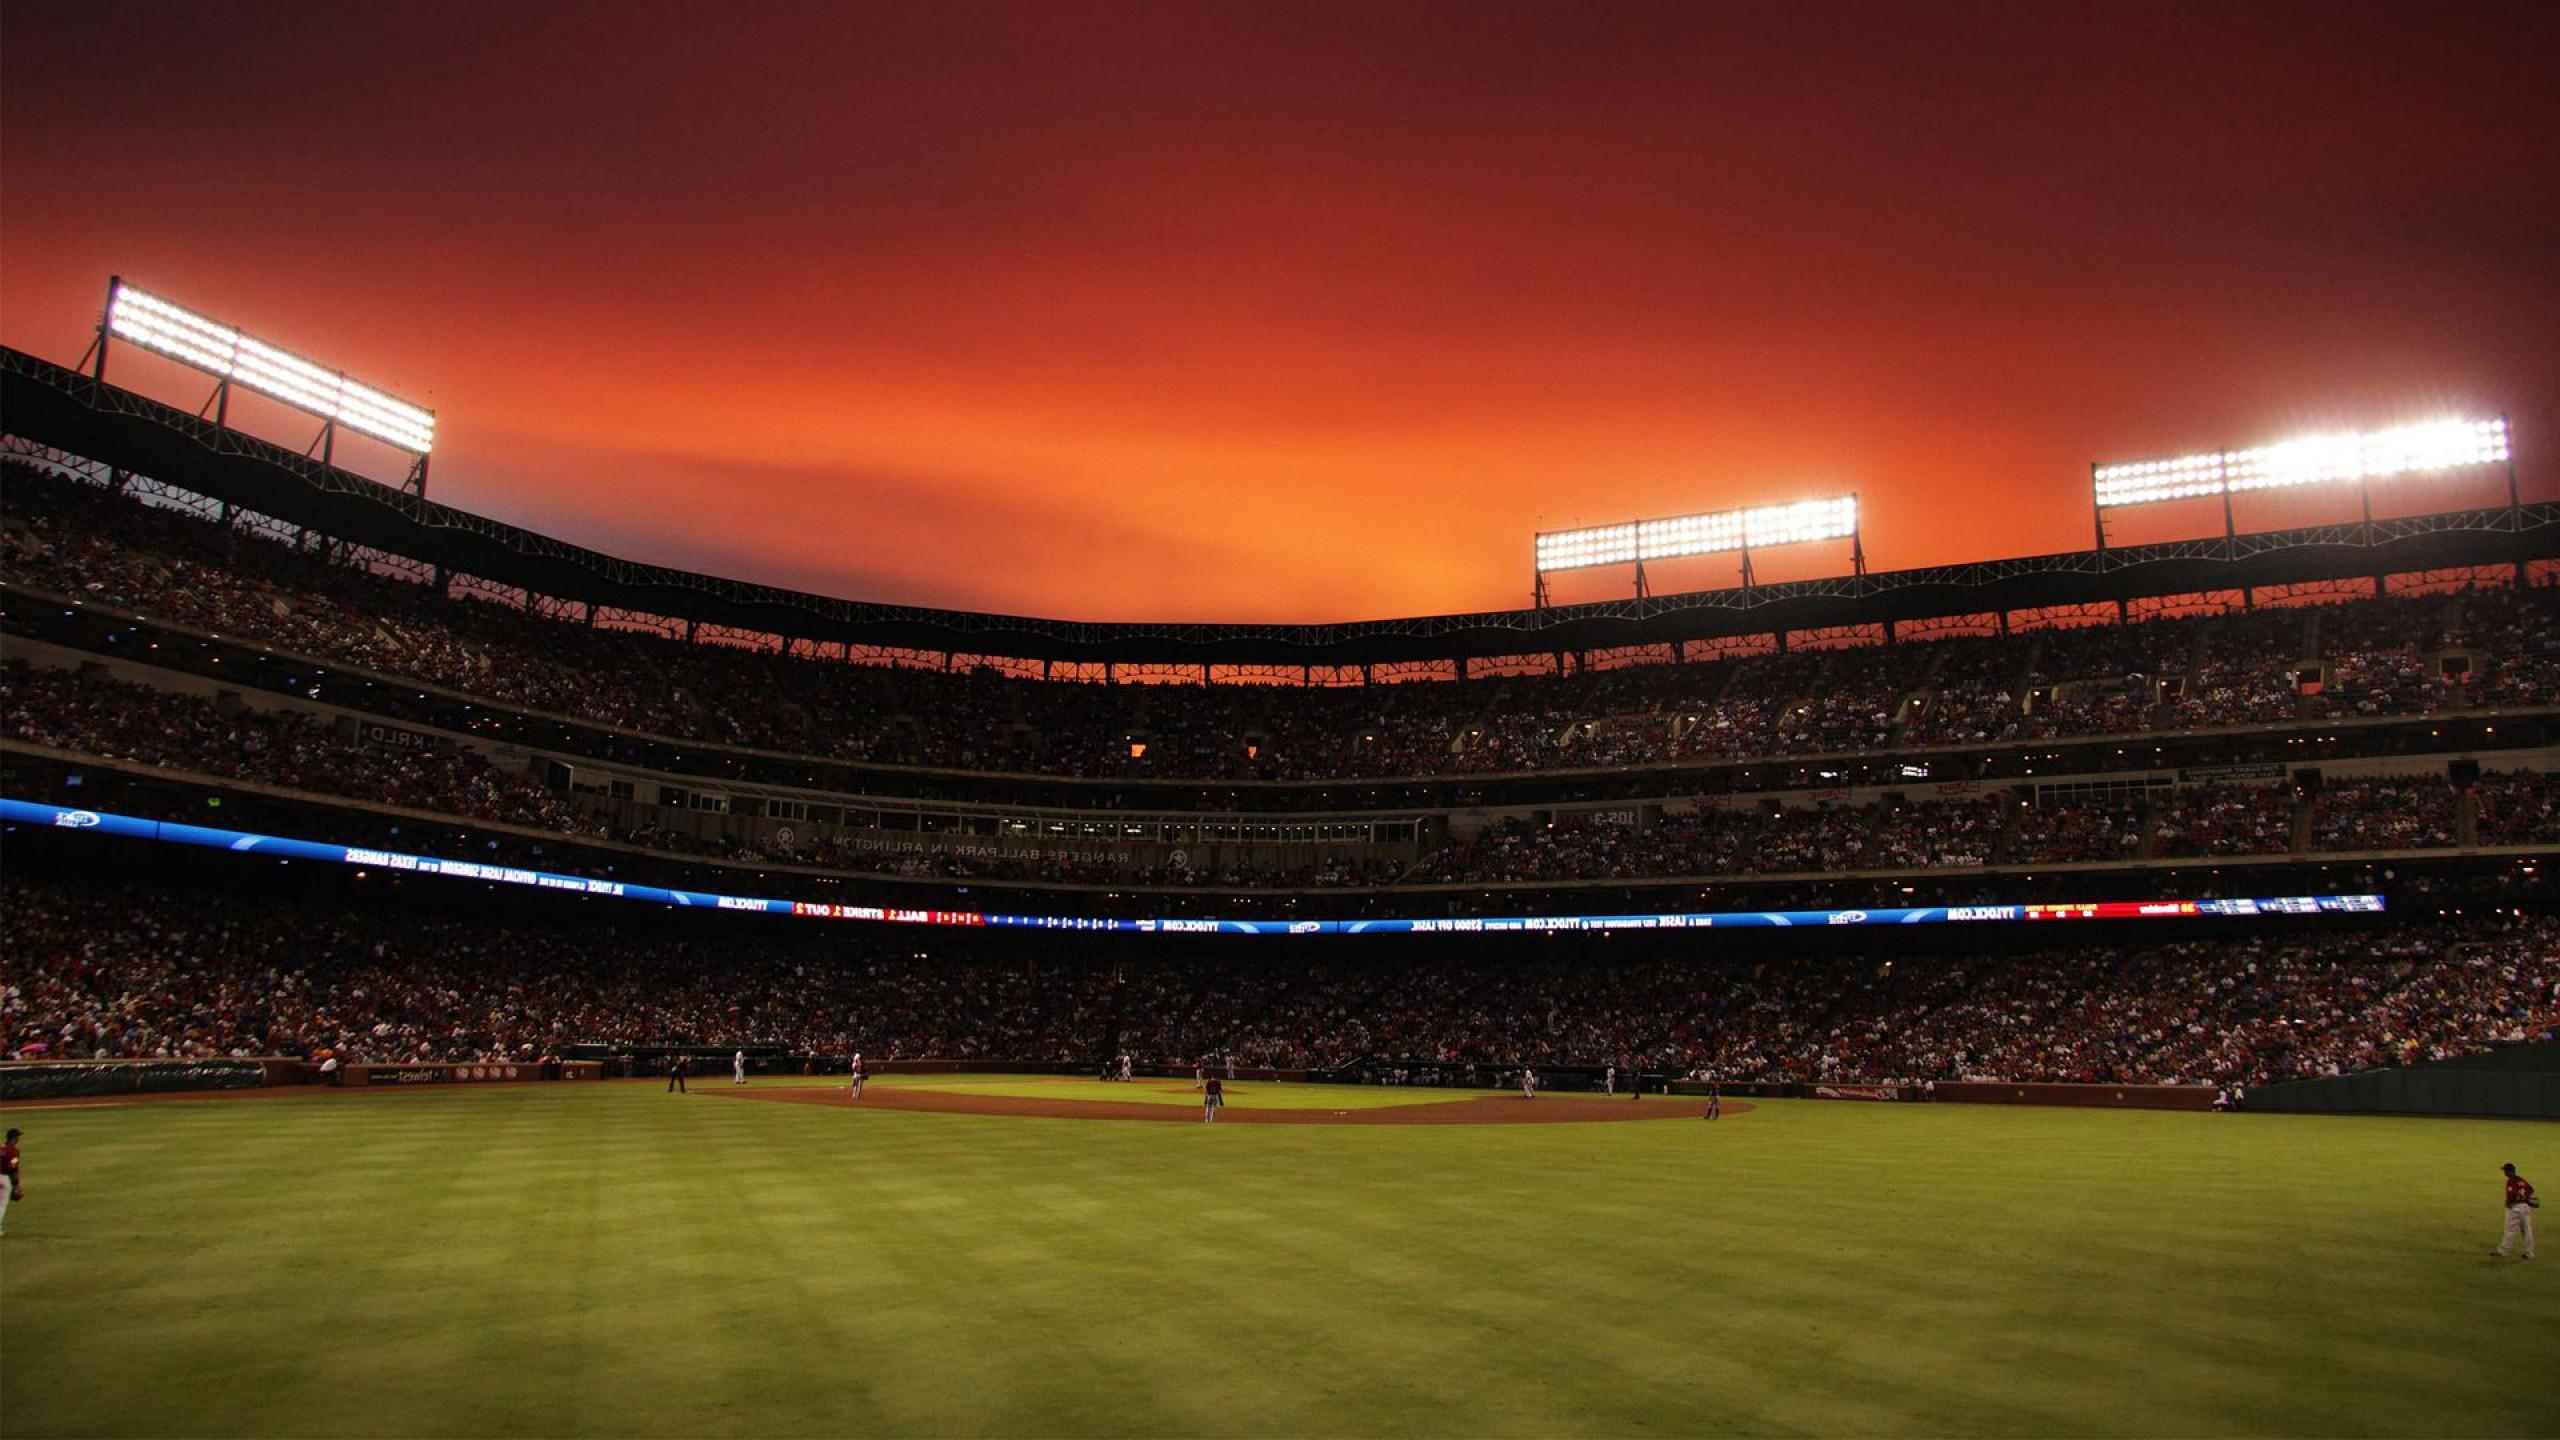 Baseball Stadium Wallpaper